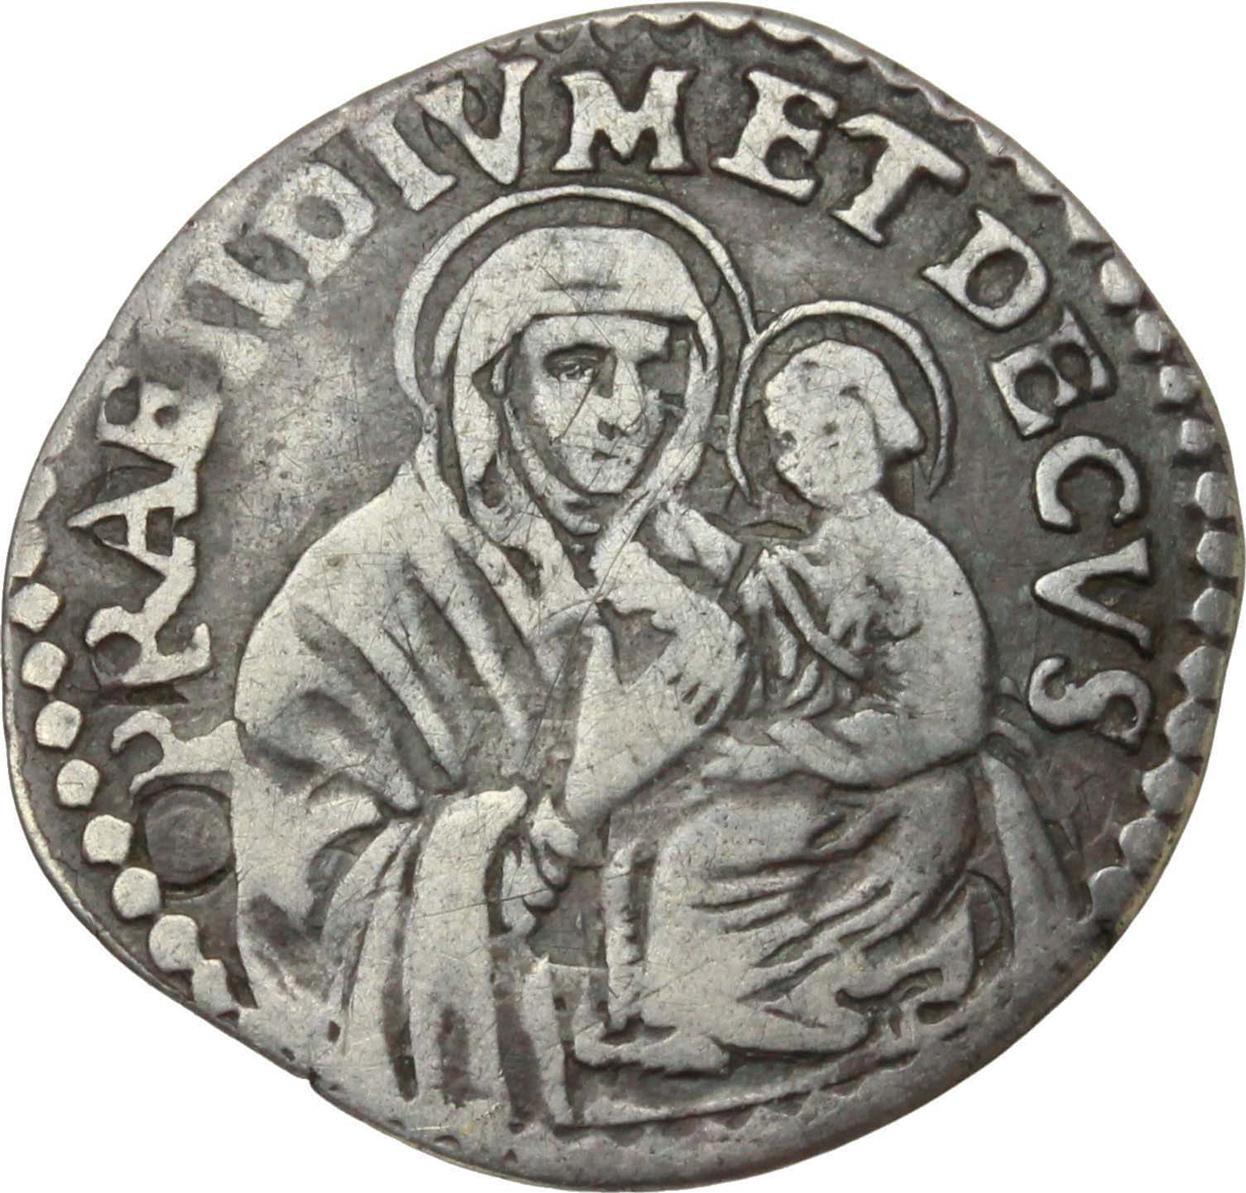 5d5a509d6b ... numismatica bologna - photo#12 ...